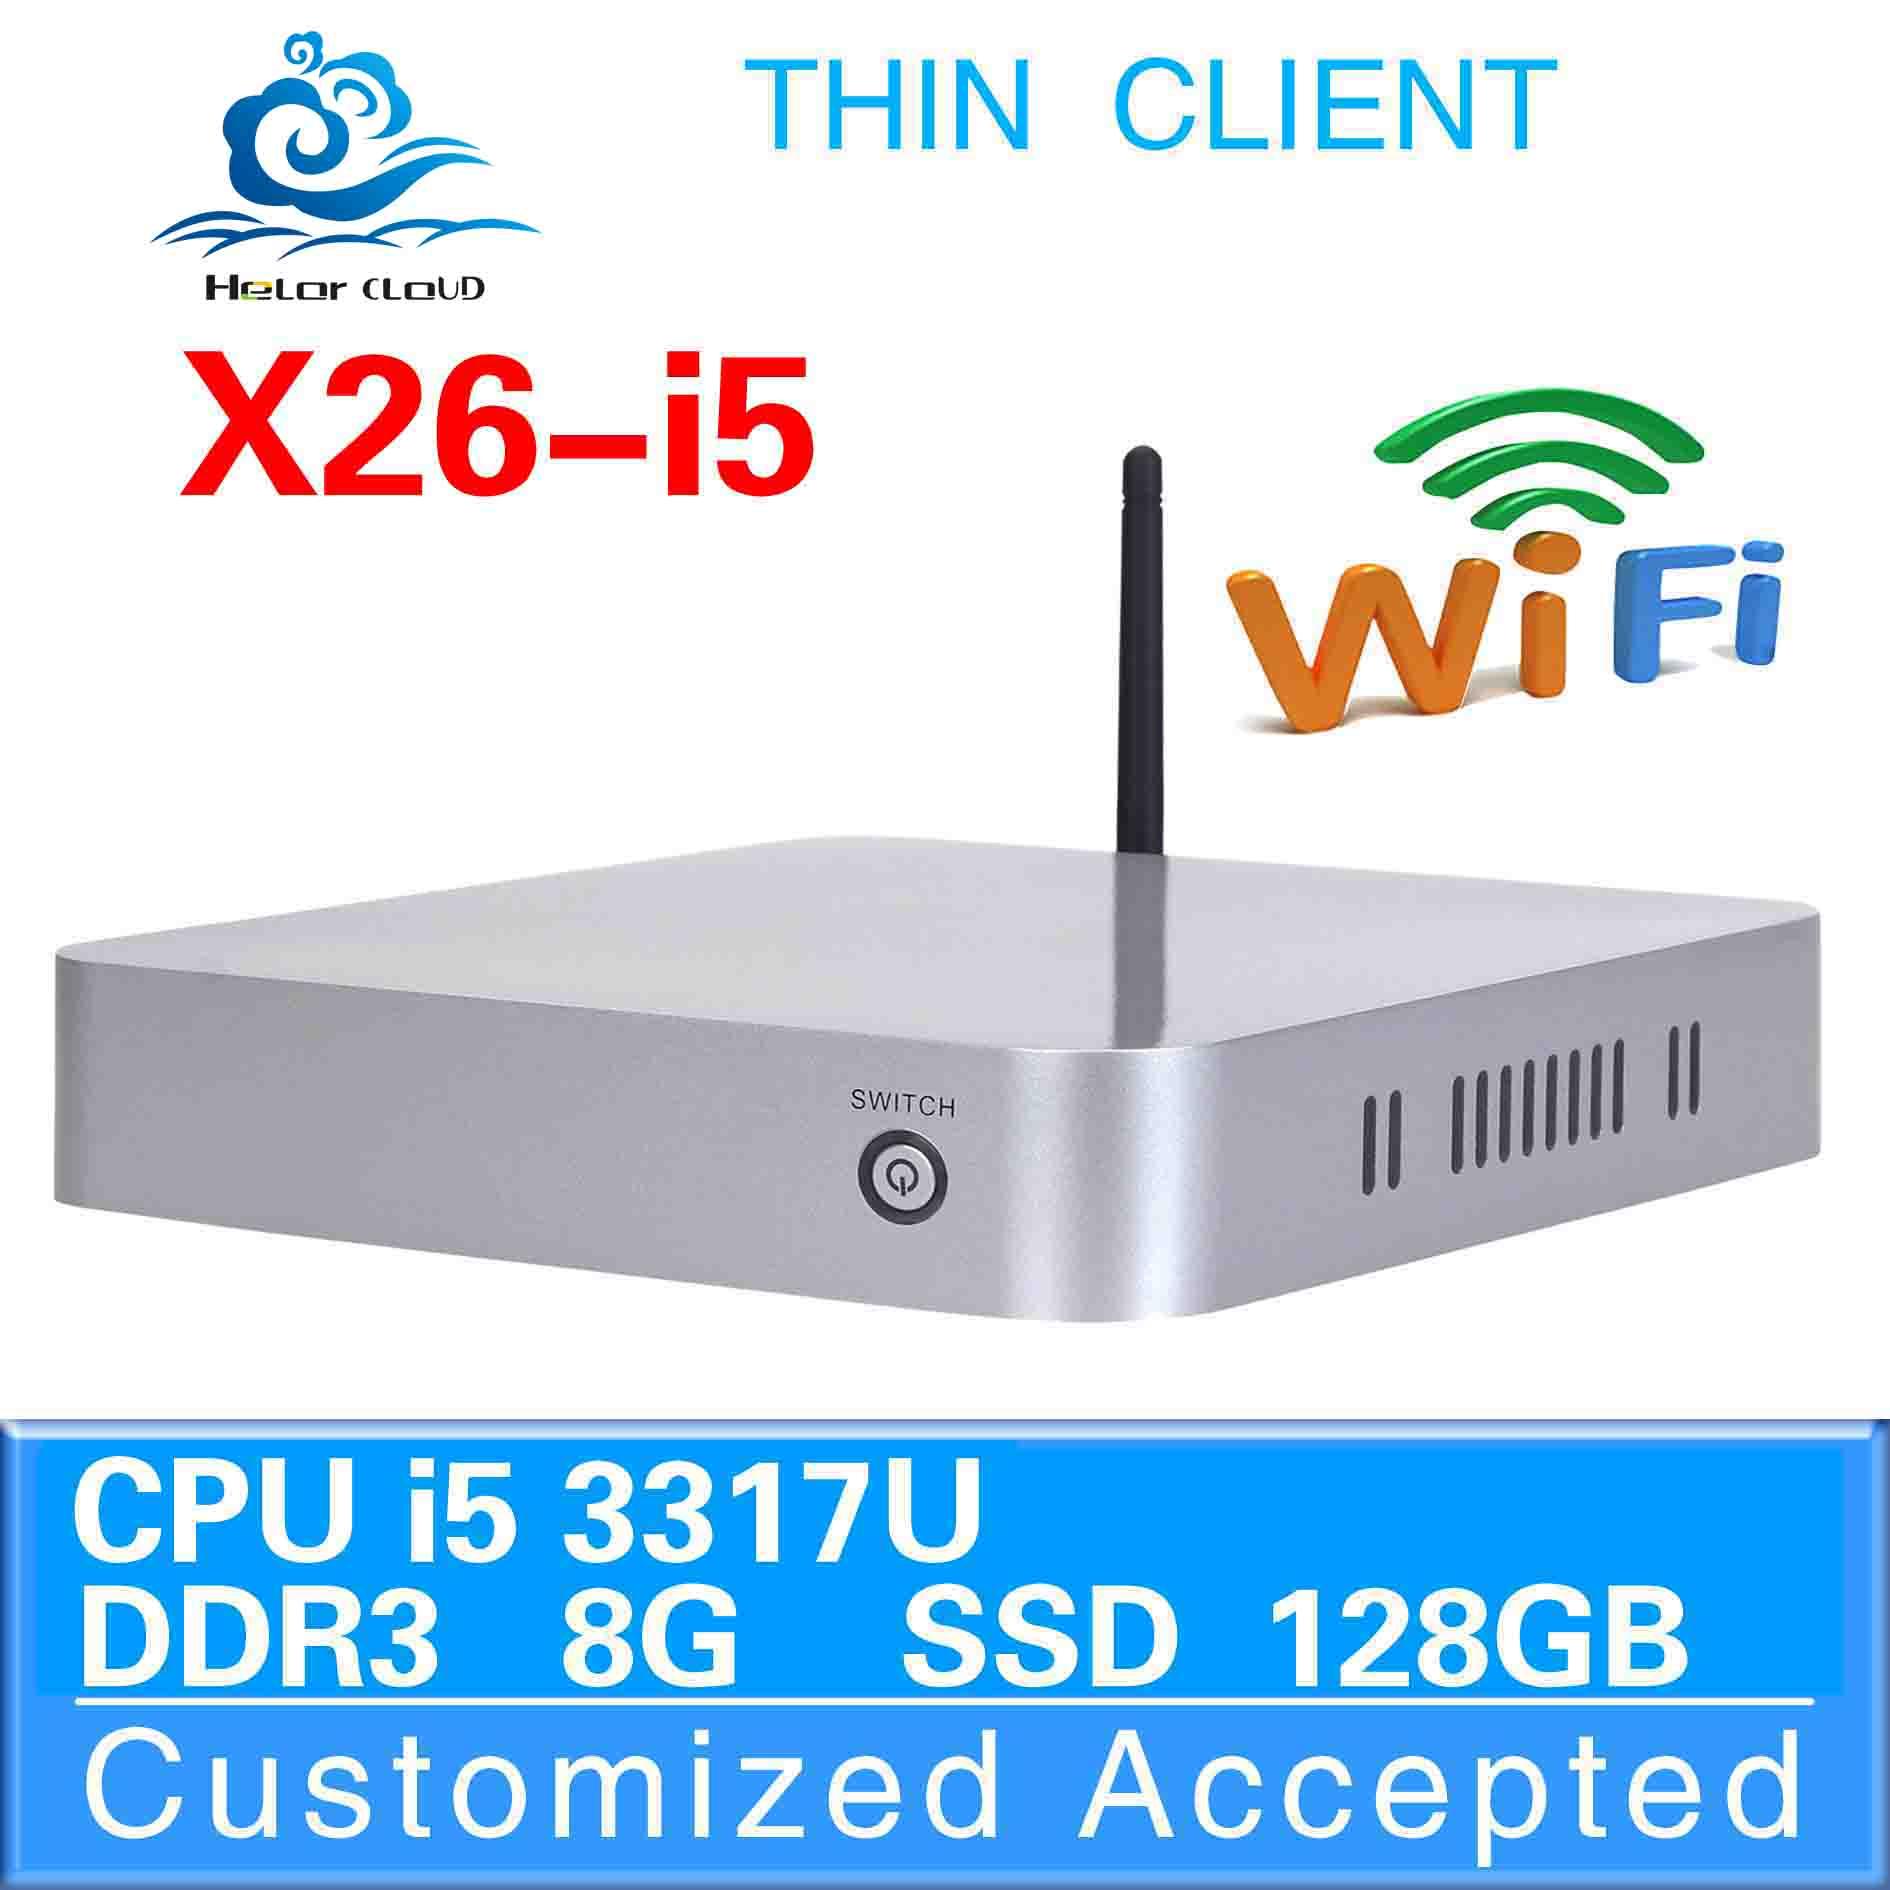 industrial PC computer thin client mini pc linux hdmi X26-I5 8GB RAM 128GB SSD support Linux, Windows 95 ,Windows XP etc.(China (Mainland))